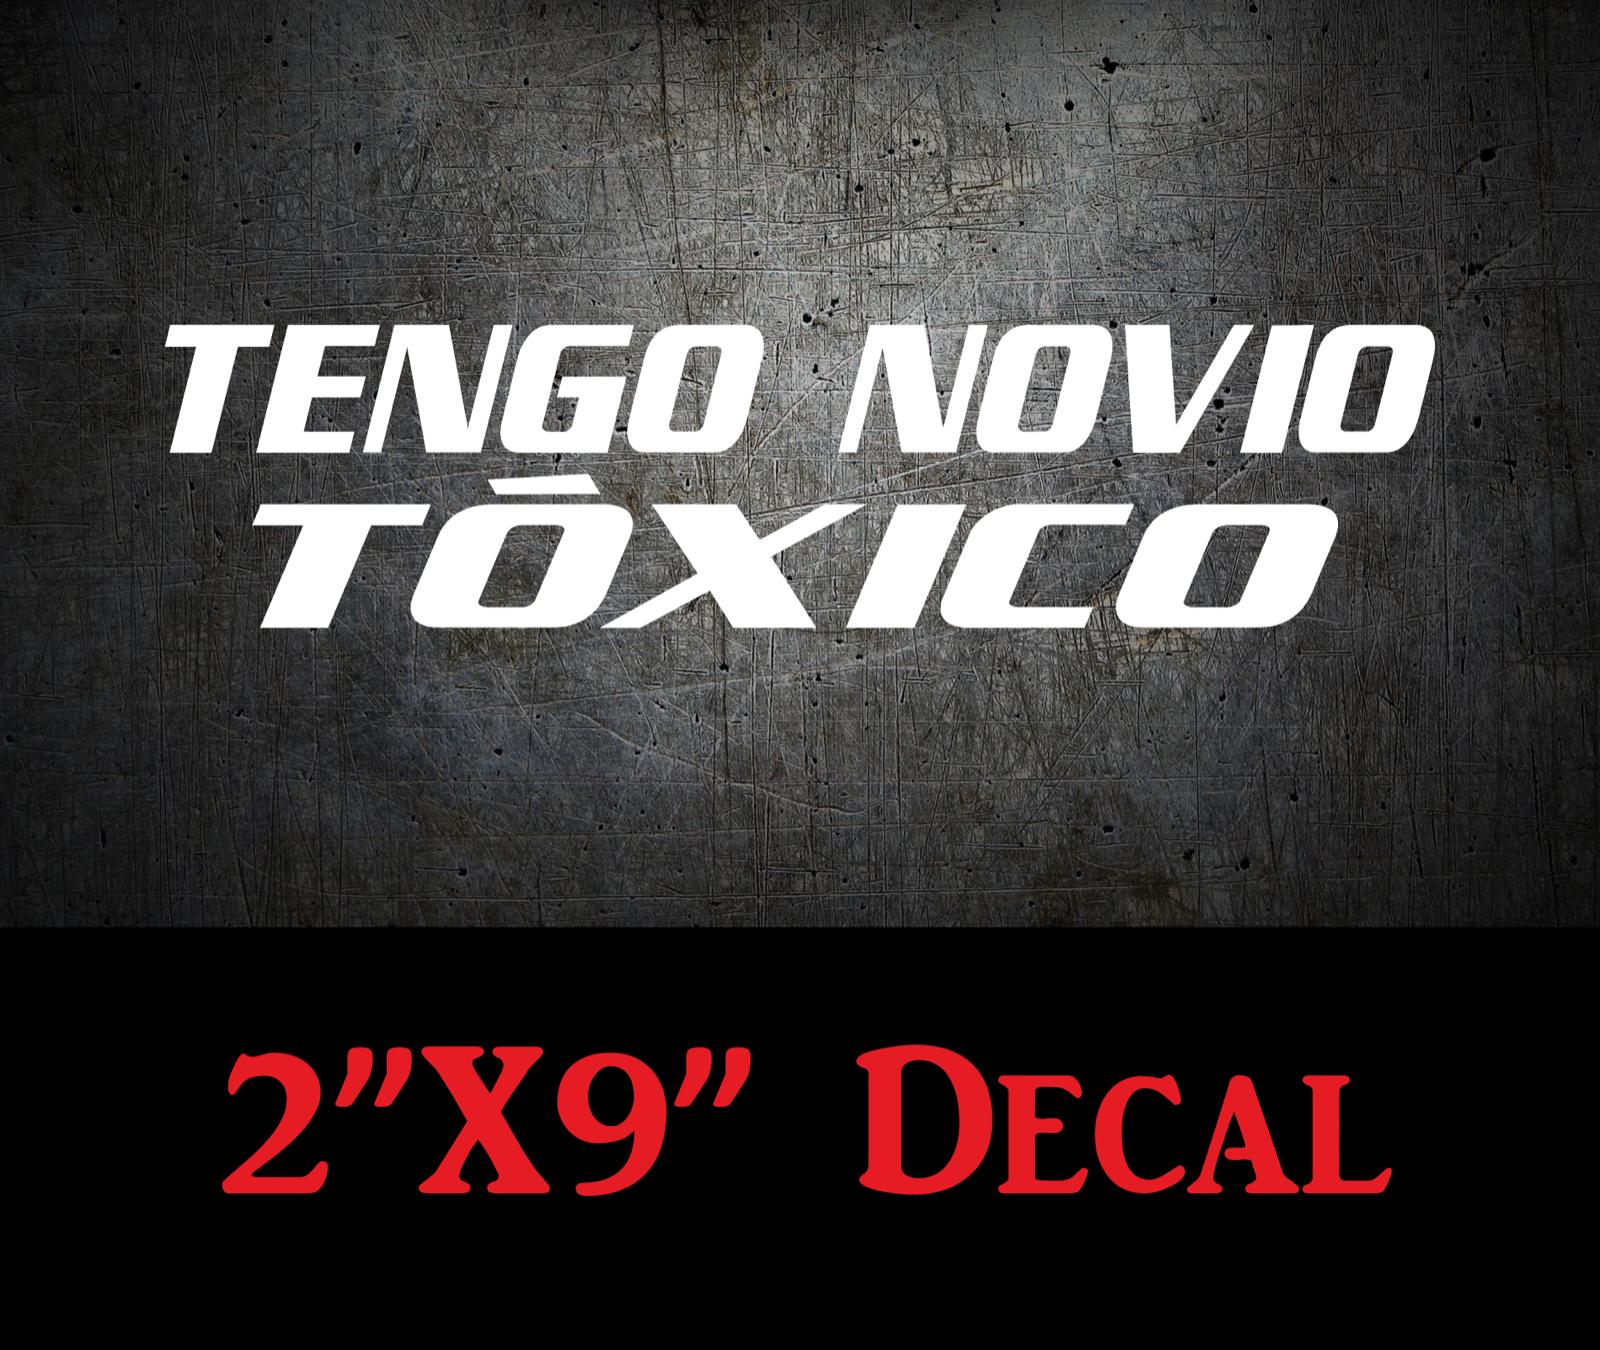 Home Decoration - TENGO NOVIO TOXICO, Funny Decal Sticker Window Mexican Spanish Boyfriend Husband